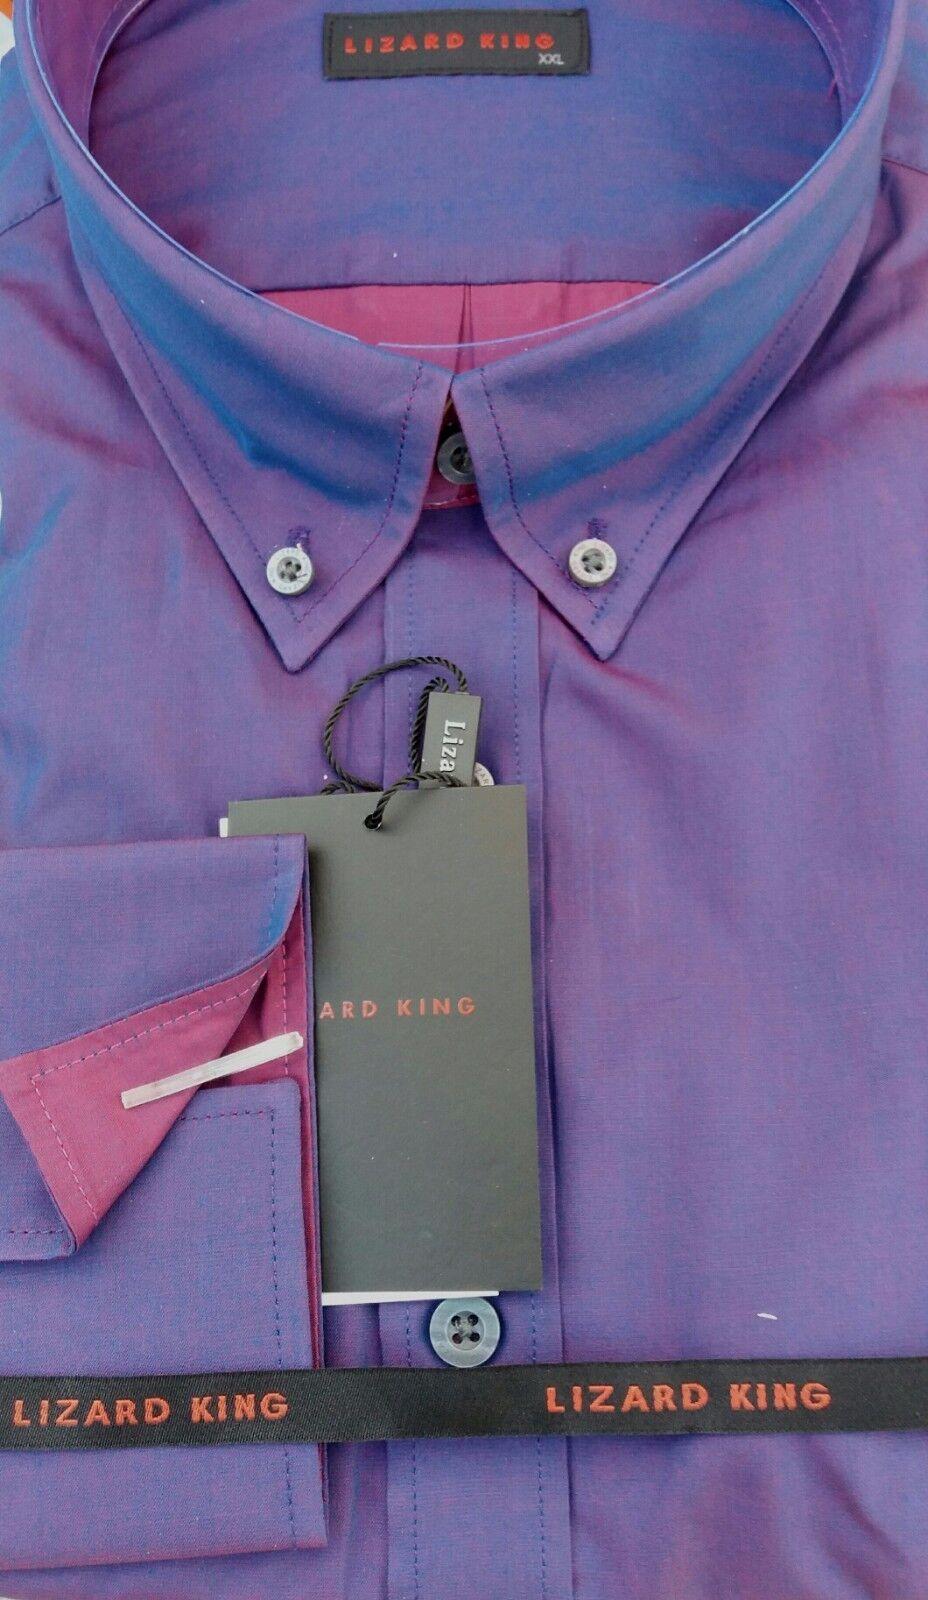 Mod  BusCoche Lizard King púrpuraa Dos Tonos Tonic Camisa LK17241KS  para barato